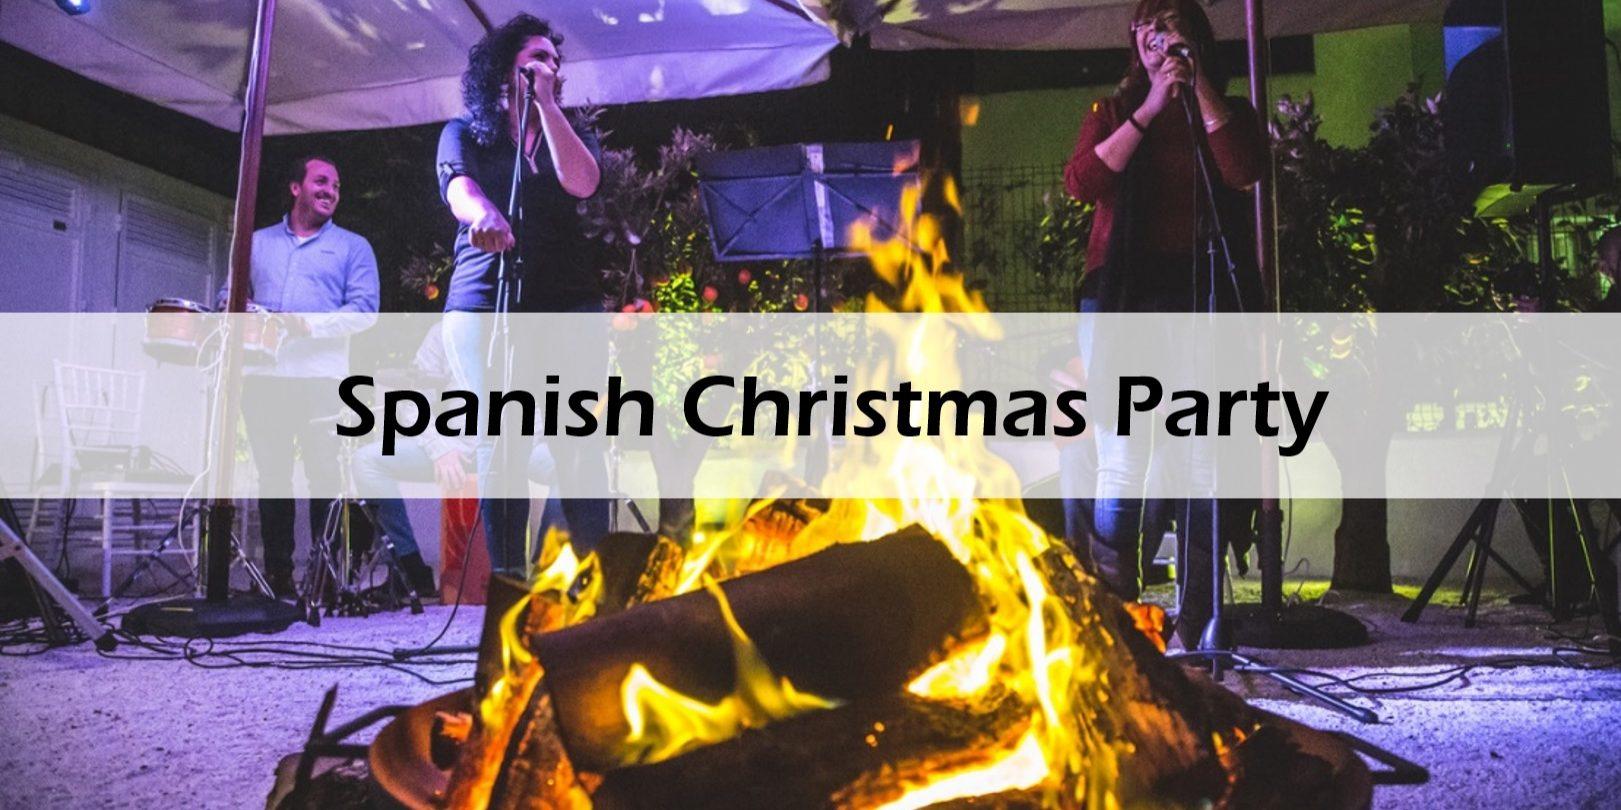 Spanish Christmas Party